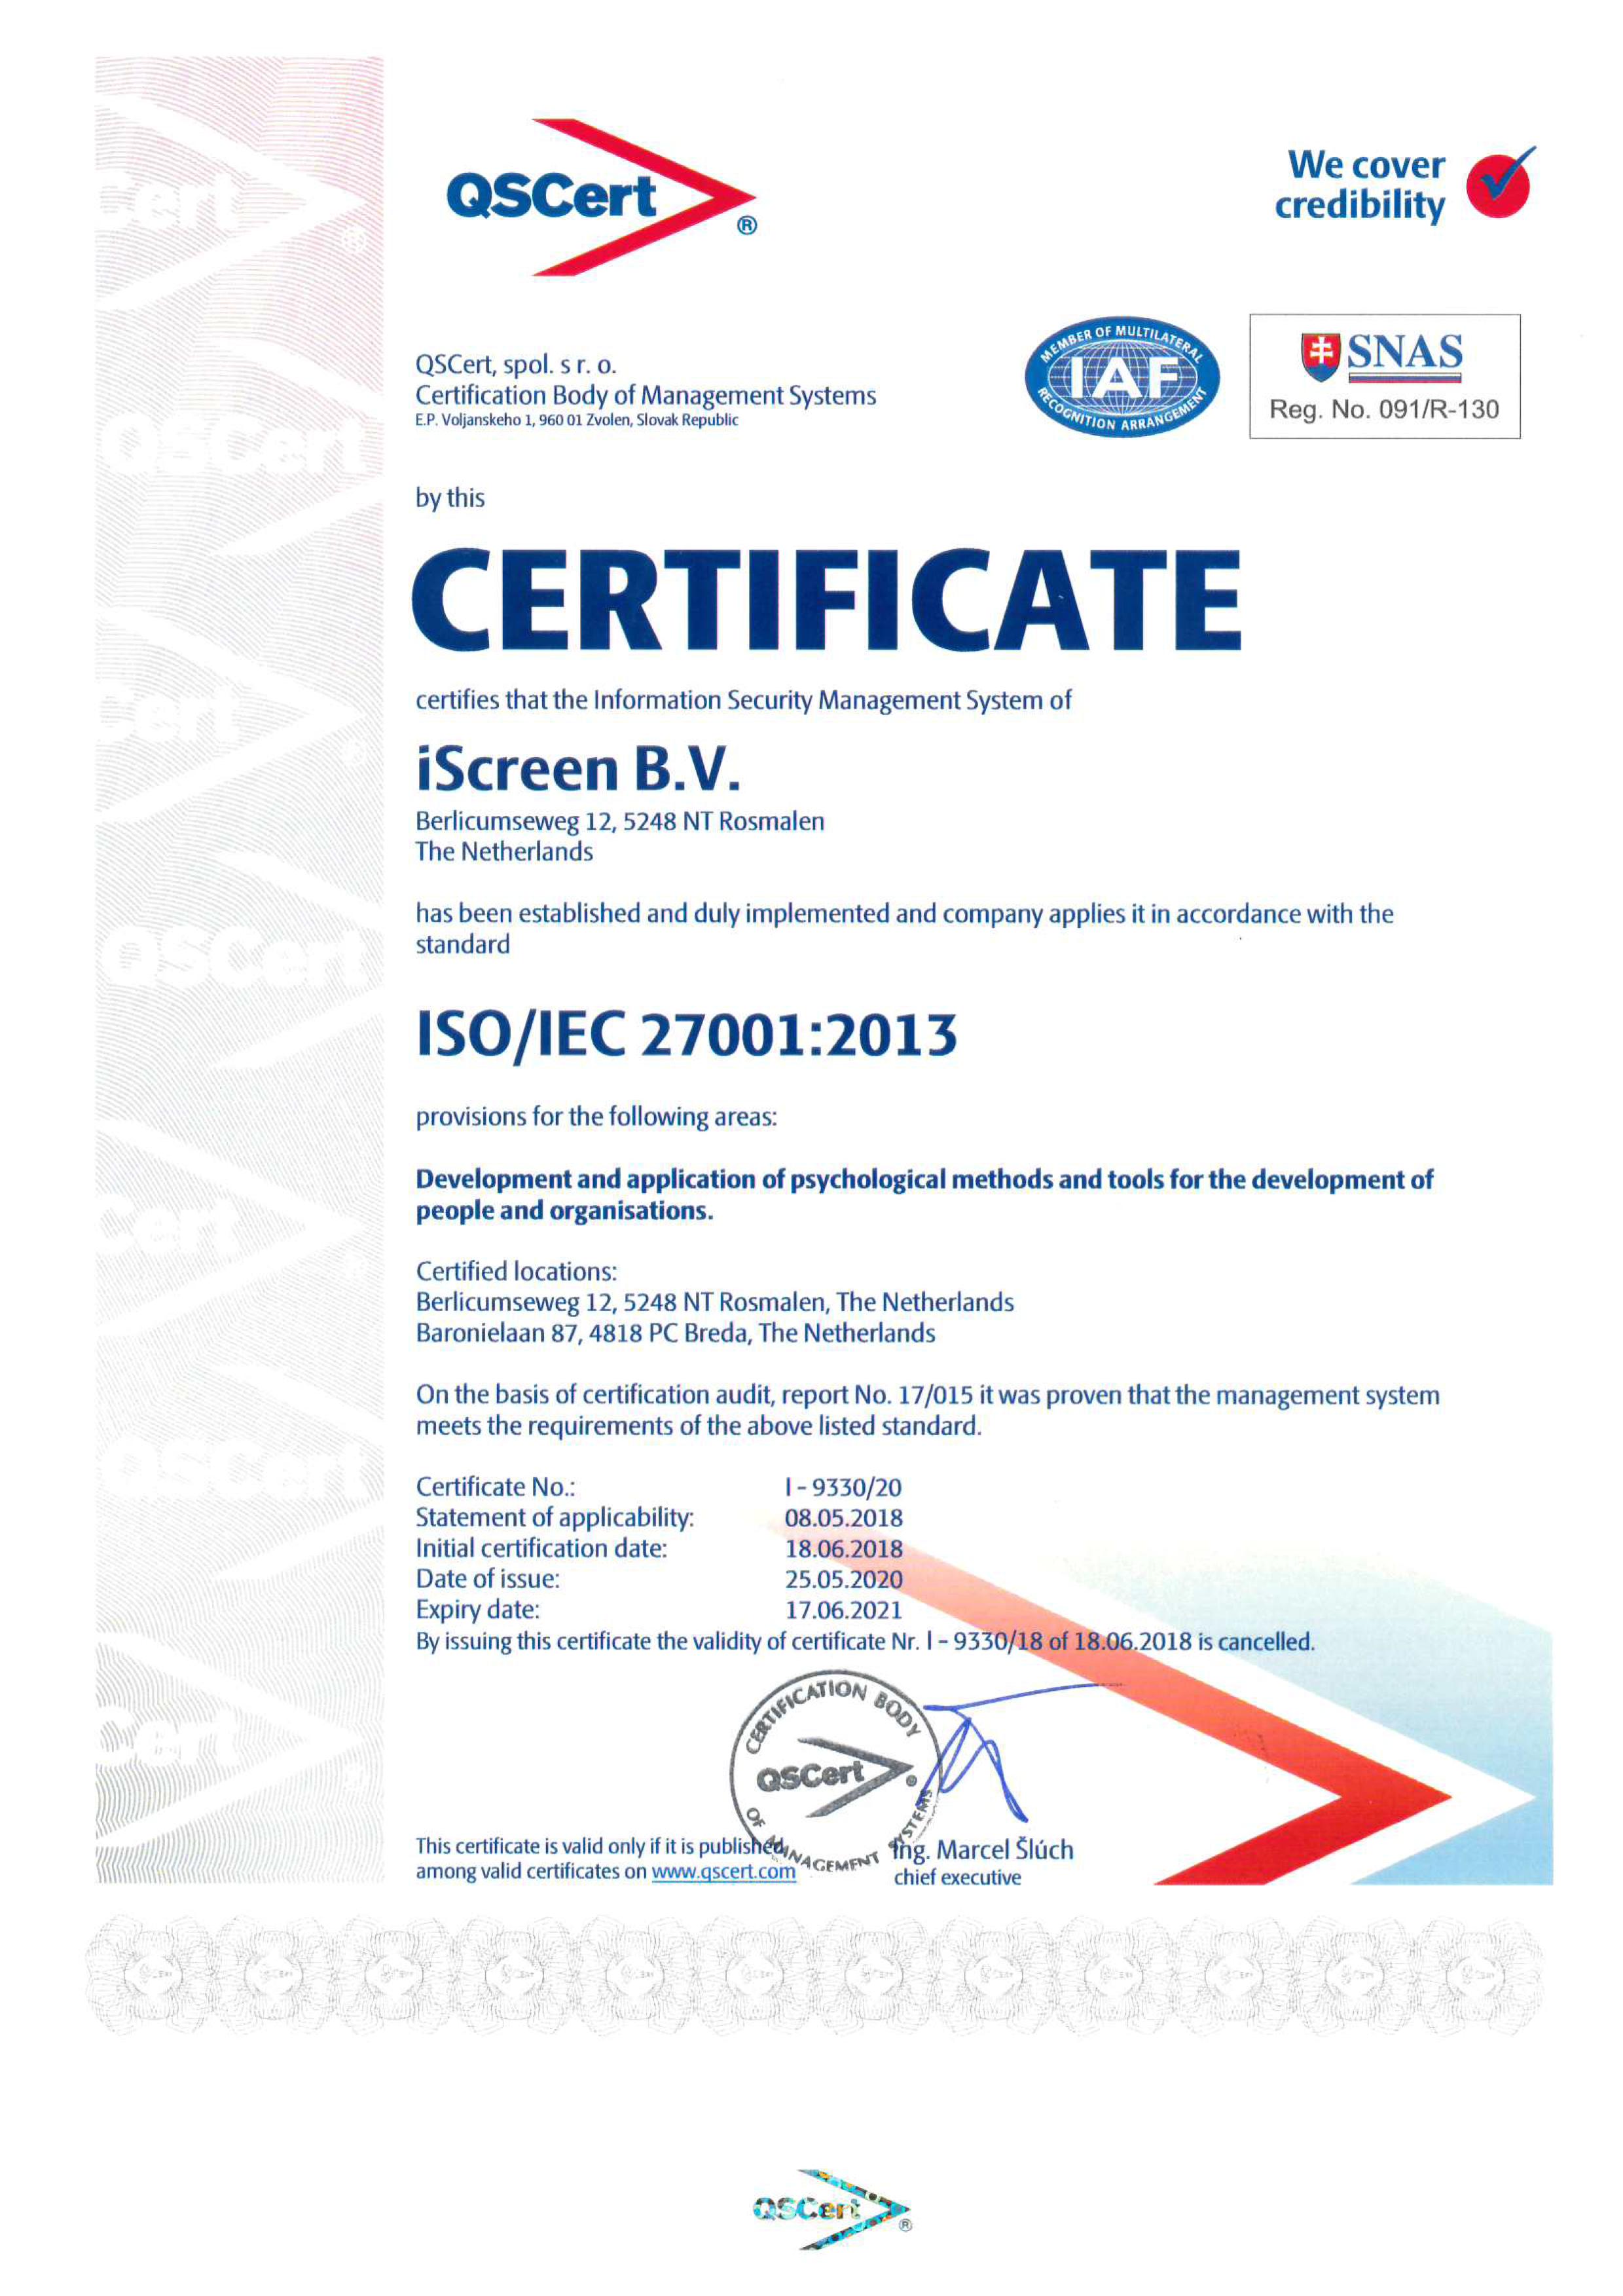 20_015_9_Certificate_27001_EN_signed.png?hash=294cf512d6b17cb1